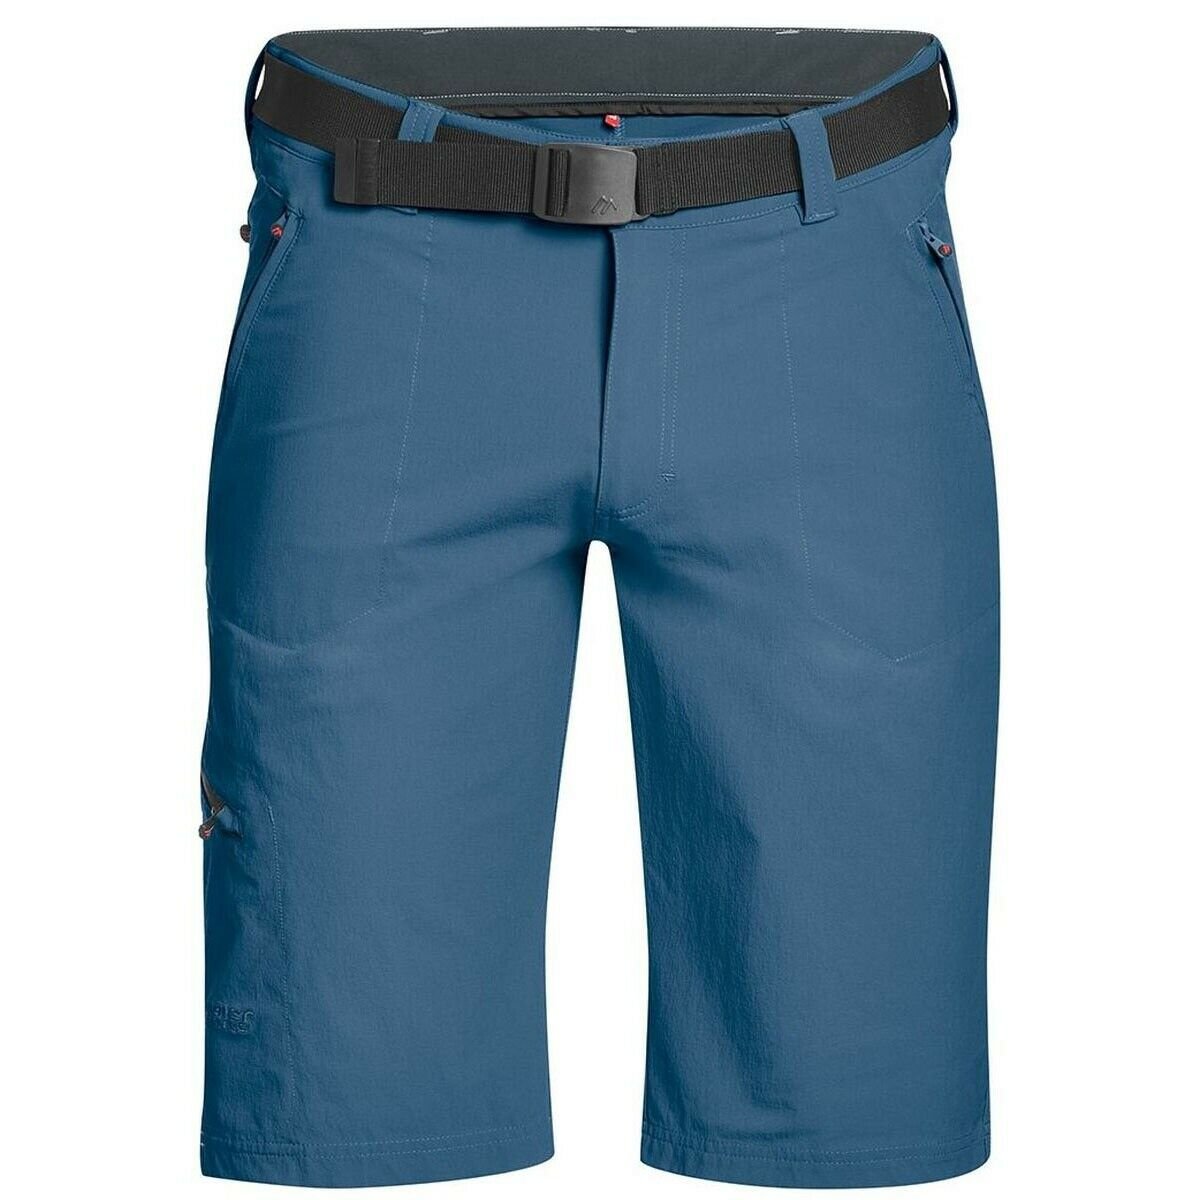 Maier Sports Nilo bermudas wanderhose corto azul